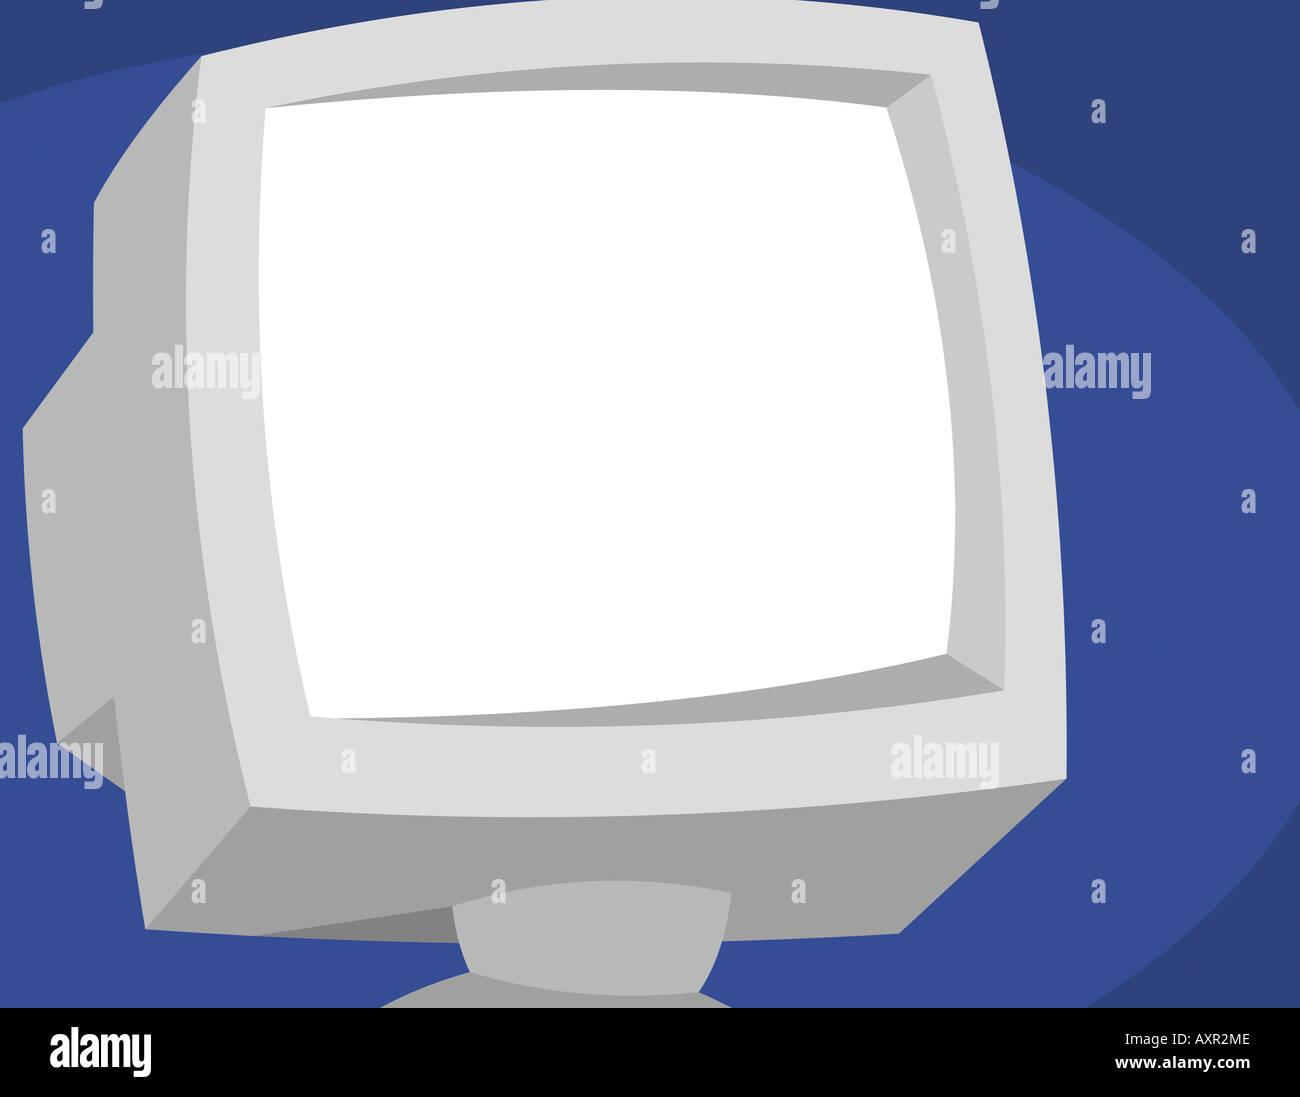 Computer illustration - Stock Image